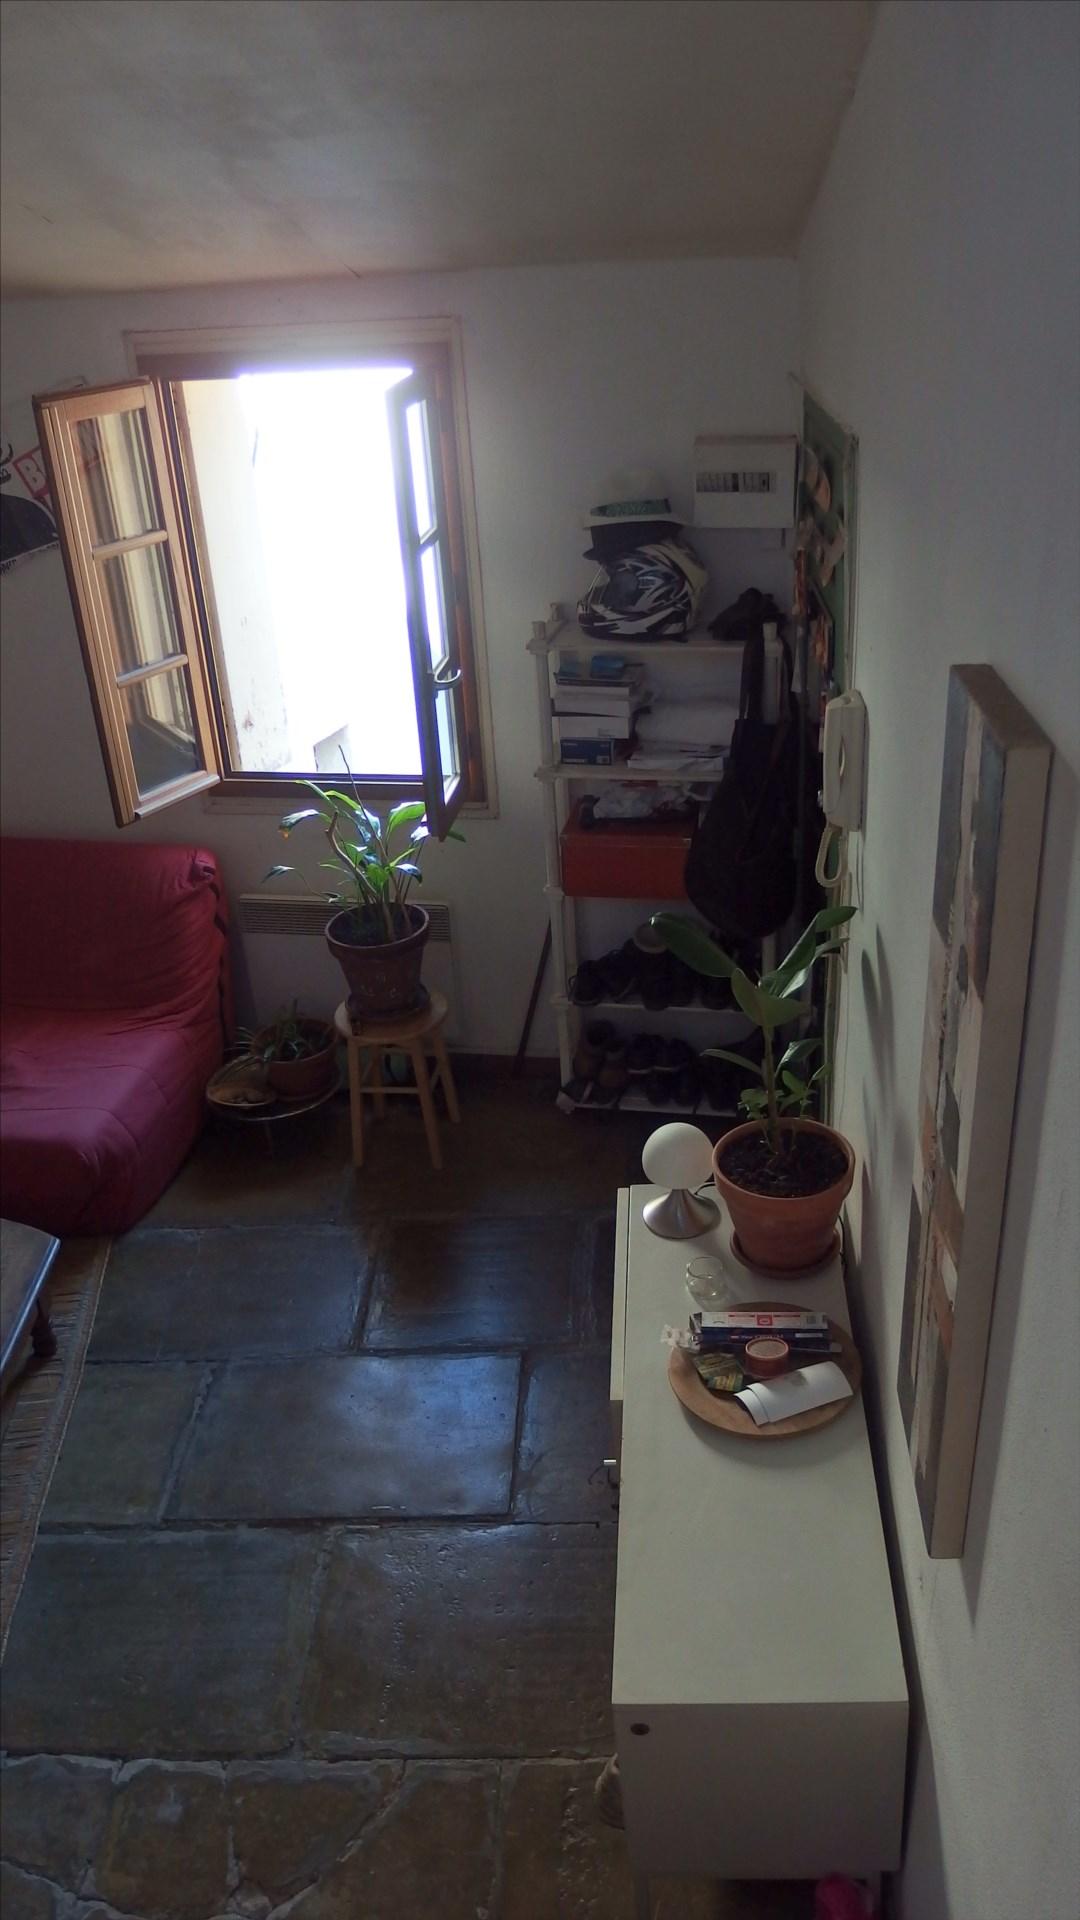 Location Appartement MONTPELLIER individuel chauffage